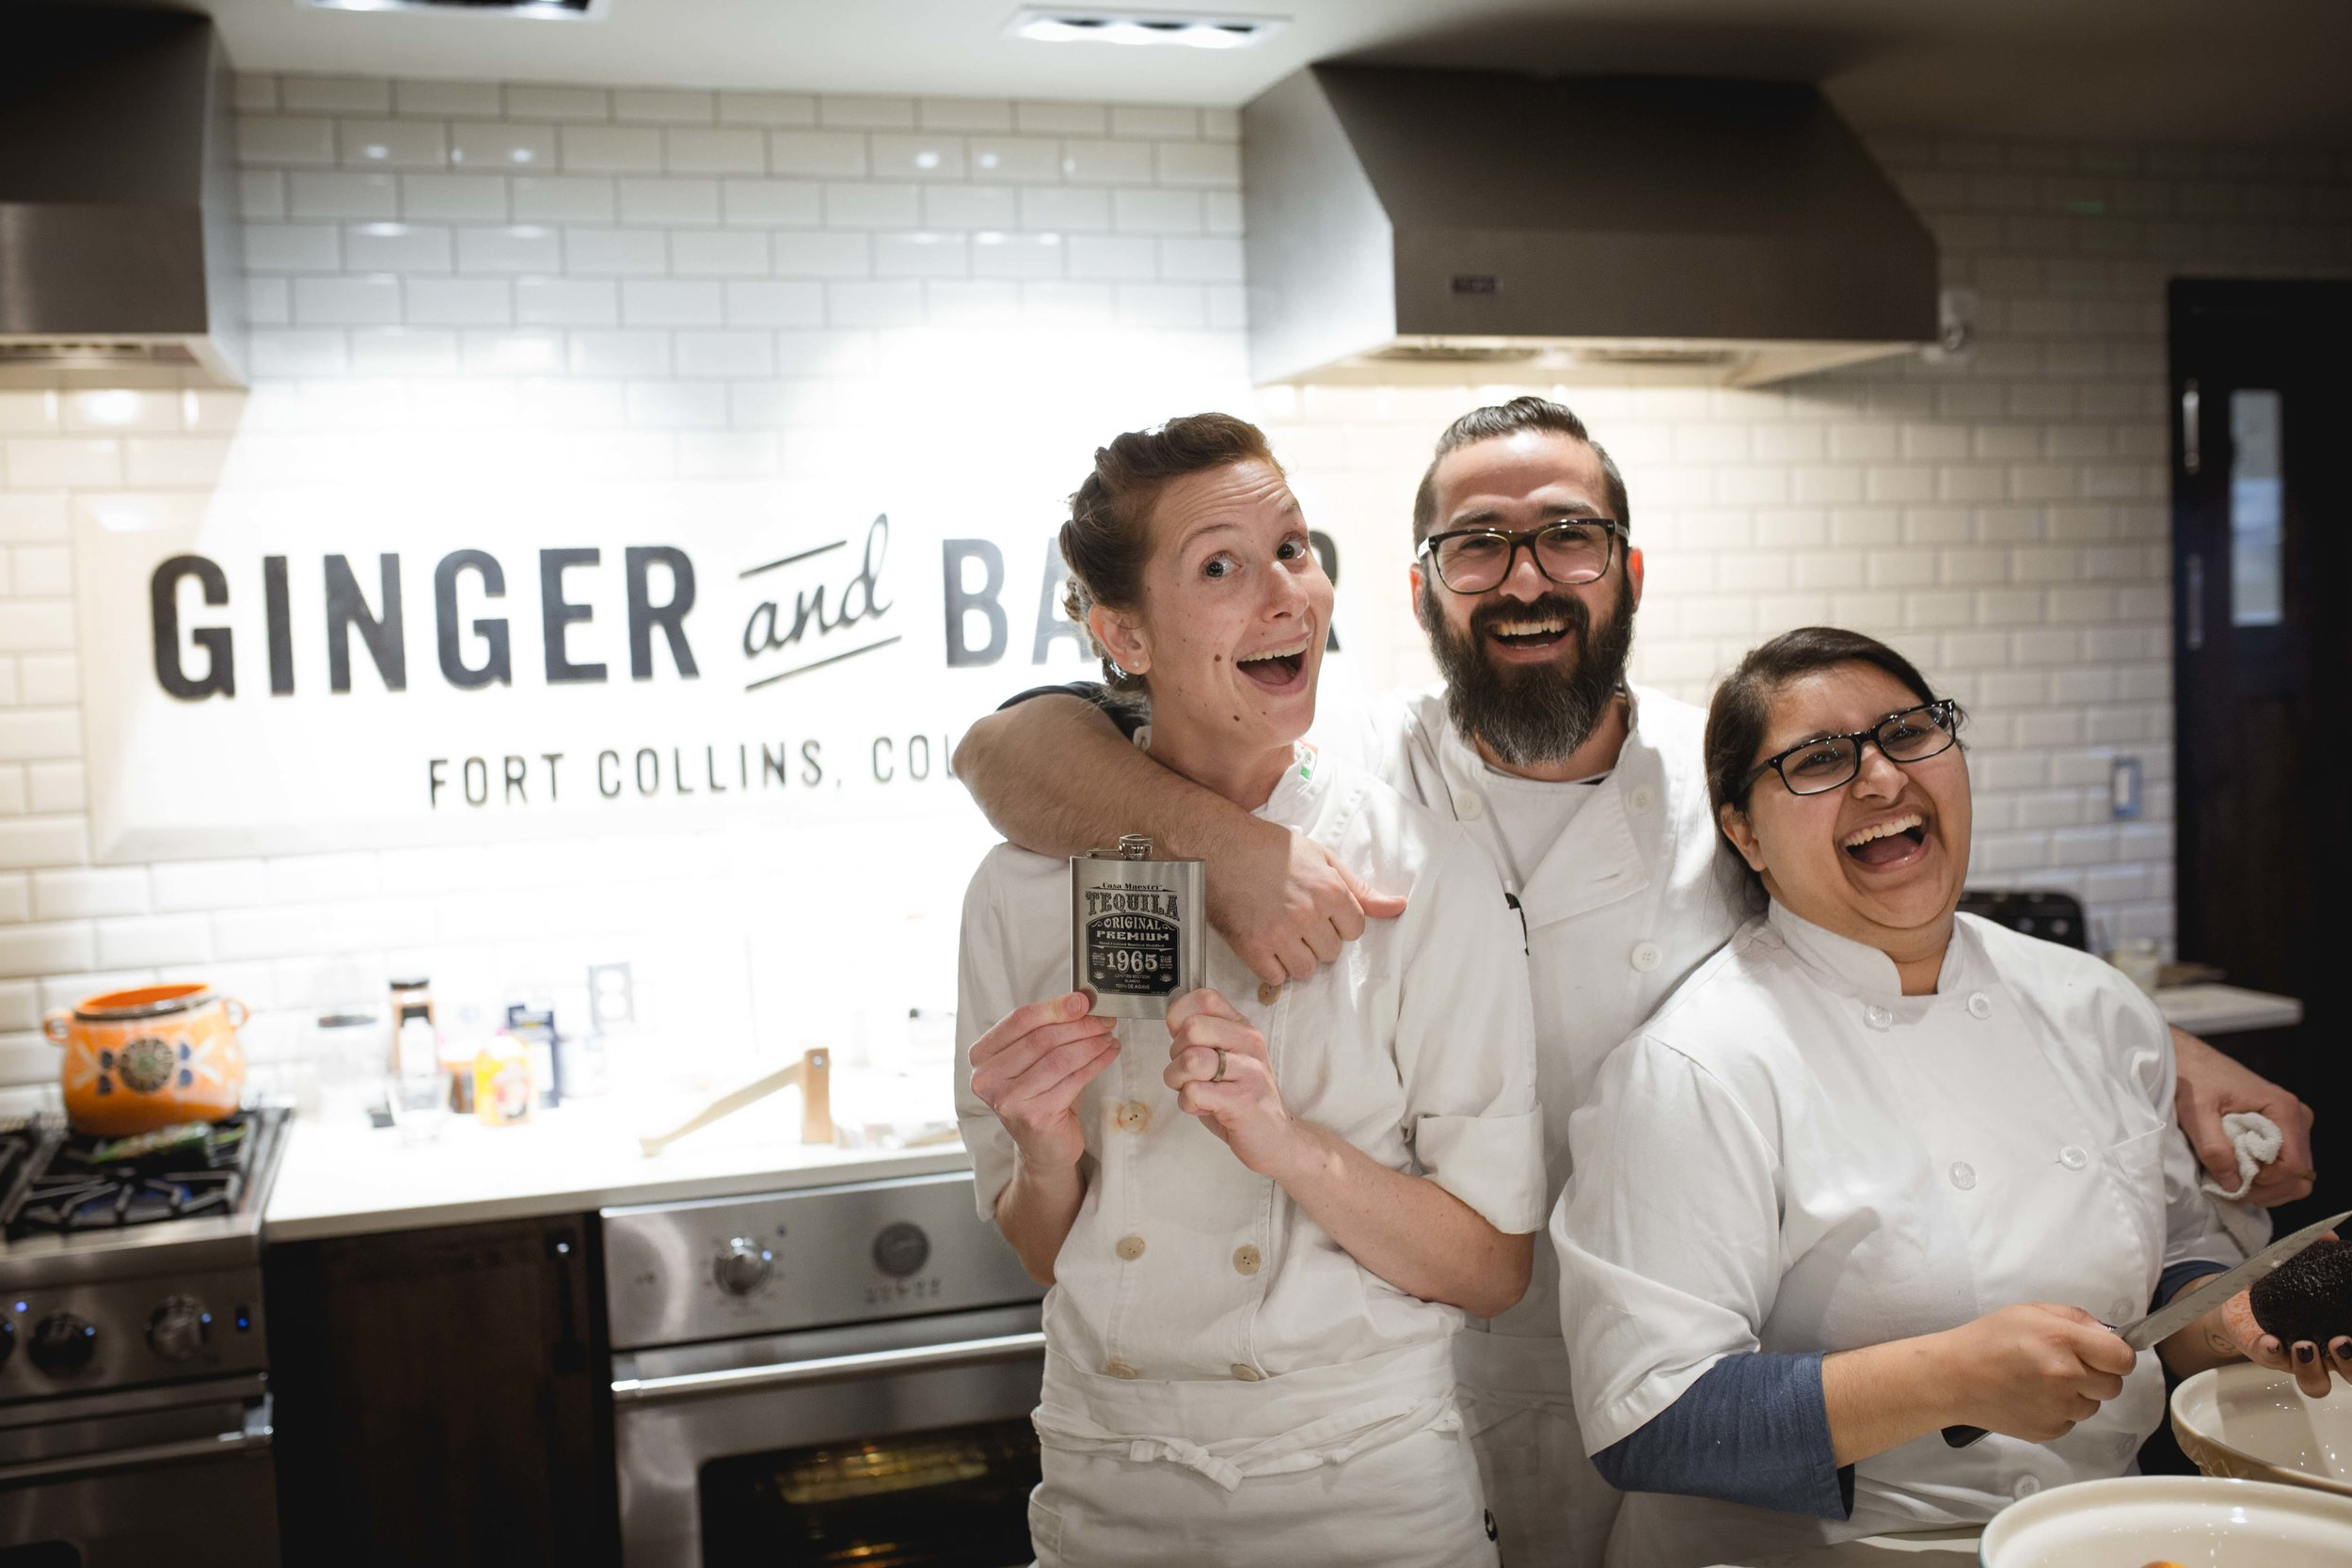 GingerandBaker-JuliyJuan-CookingClass-Feb28-8.jpg